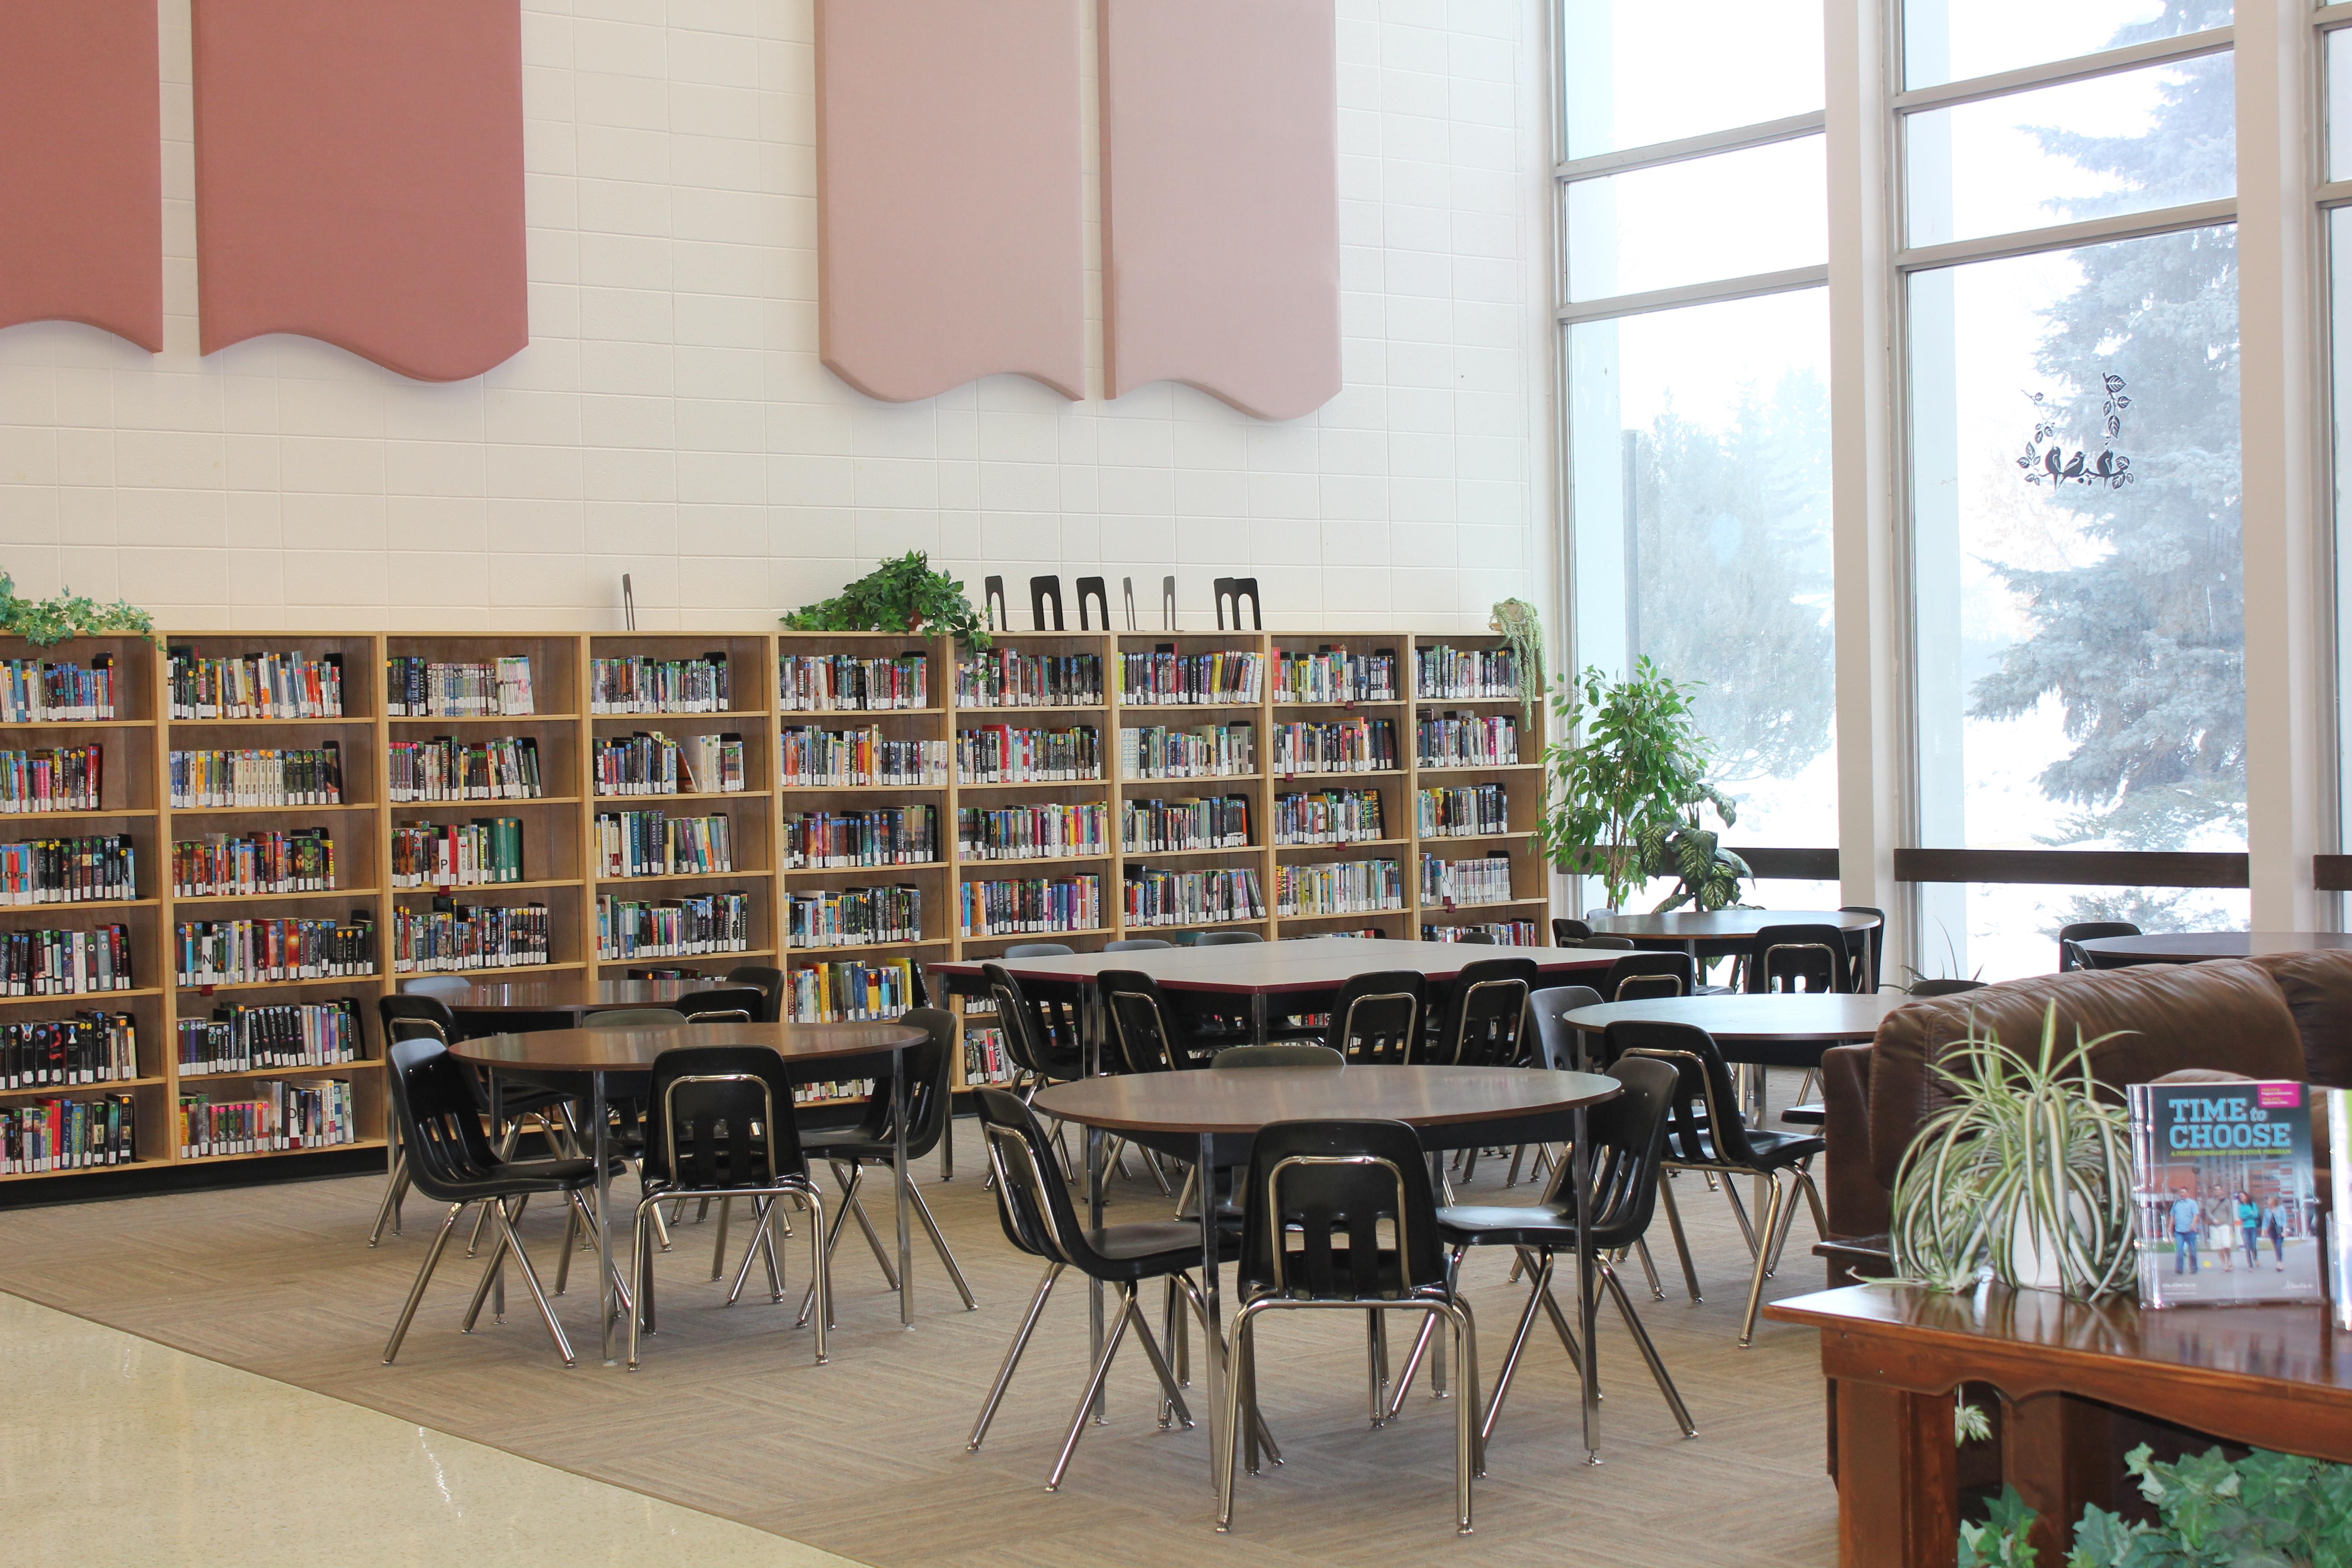 SPRHS Library 2